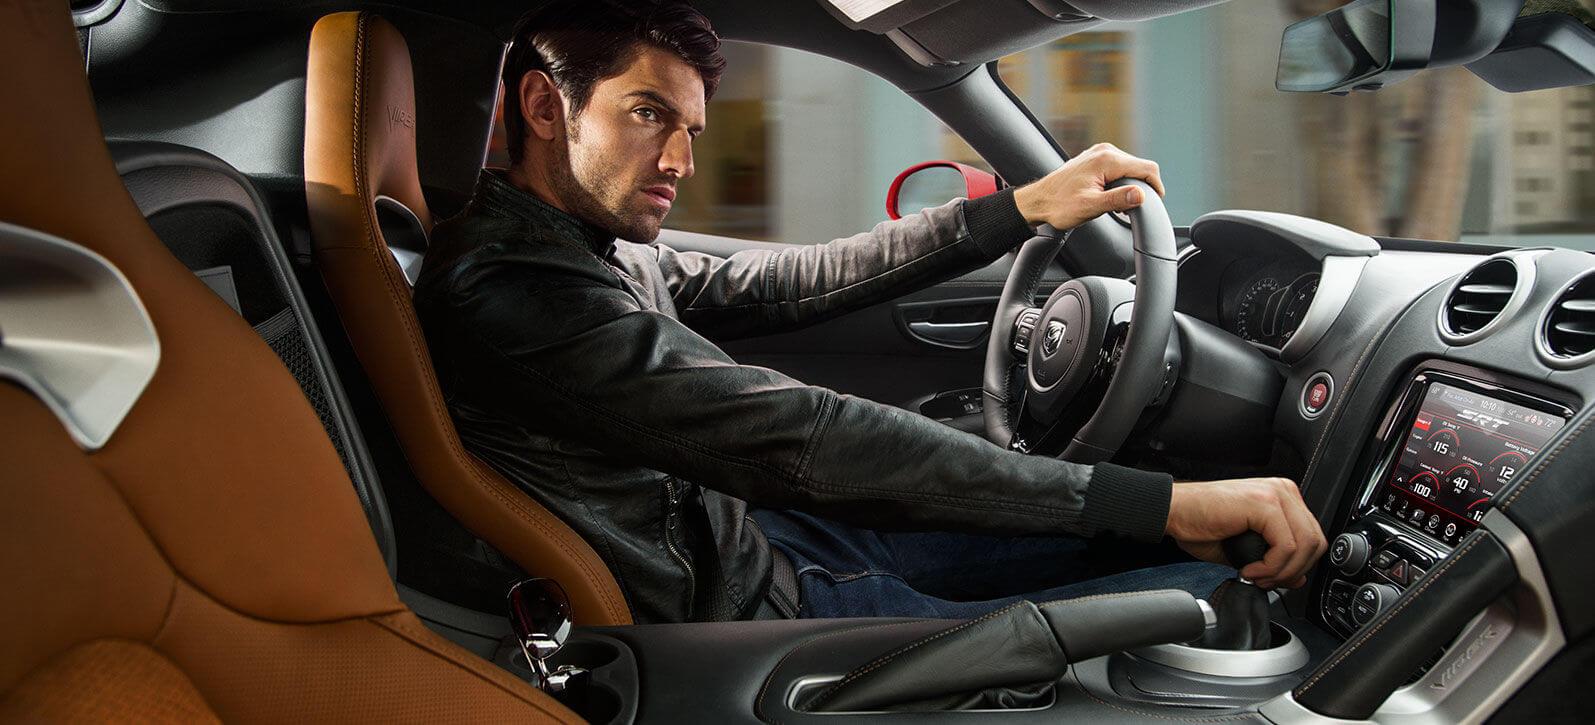 2016 Dodge Viper interior front